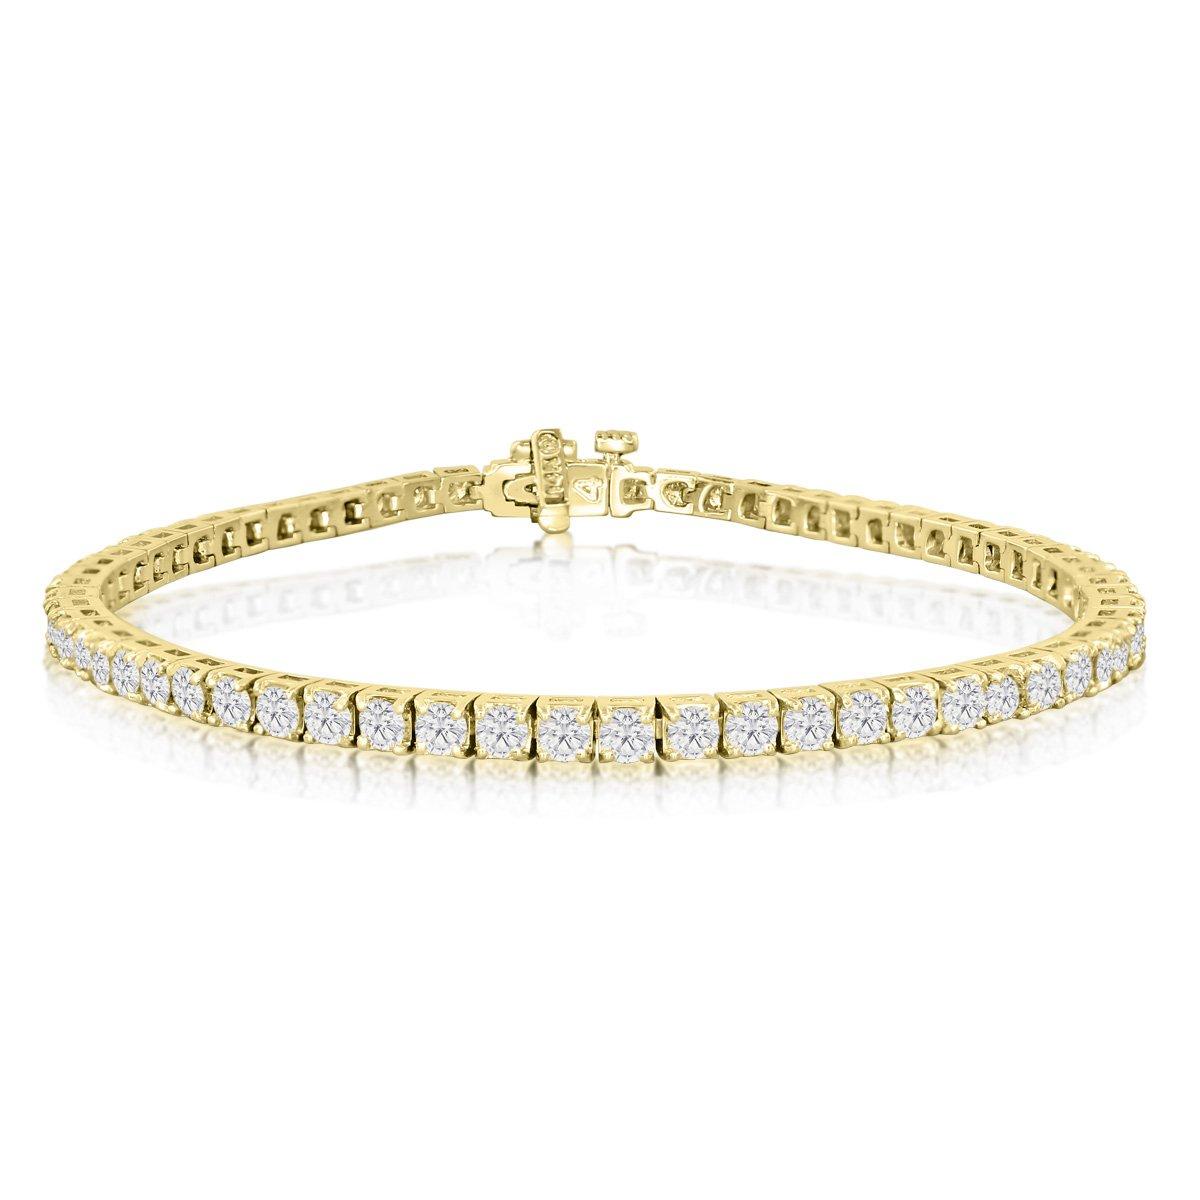 AGS Certified 14 Karat Yellow Gold 4 1/4 Carat Diamond Tennis Bracelet, Round Shape, 8 Inches